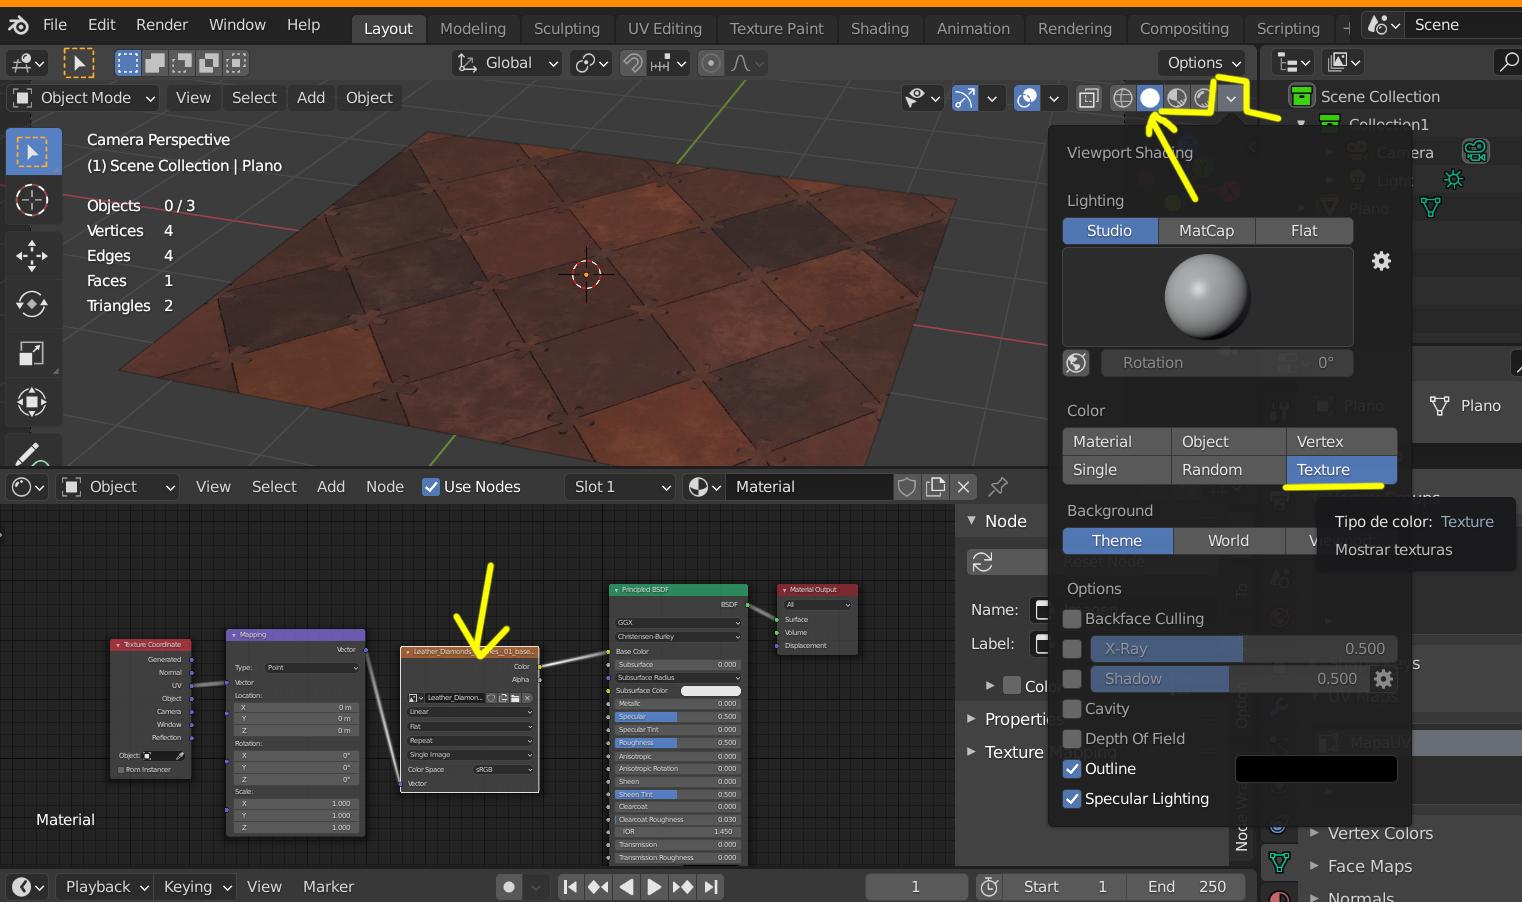 Texturas no funcionales en blender-texturas.jpg